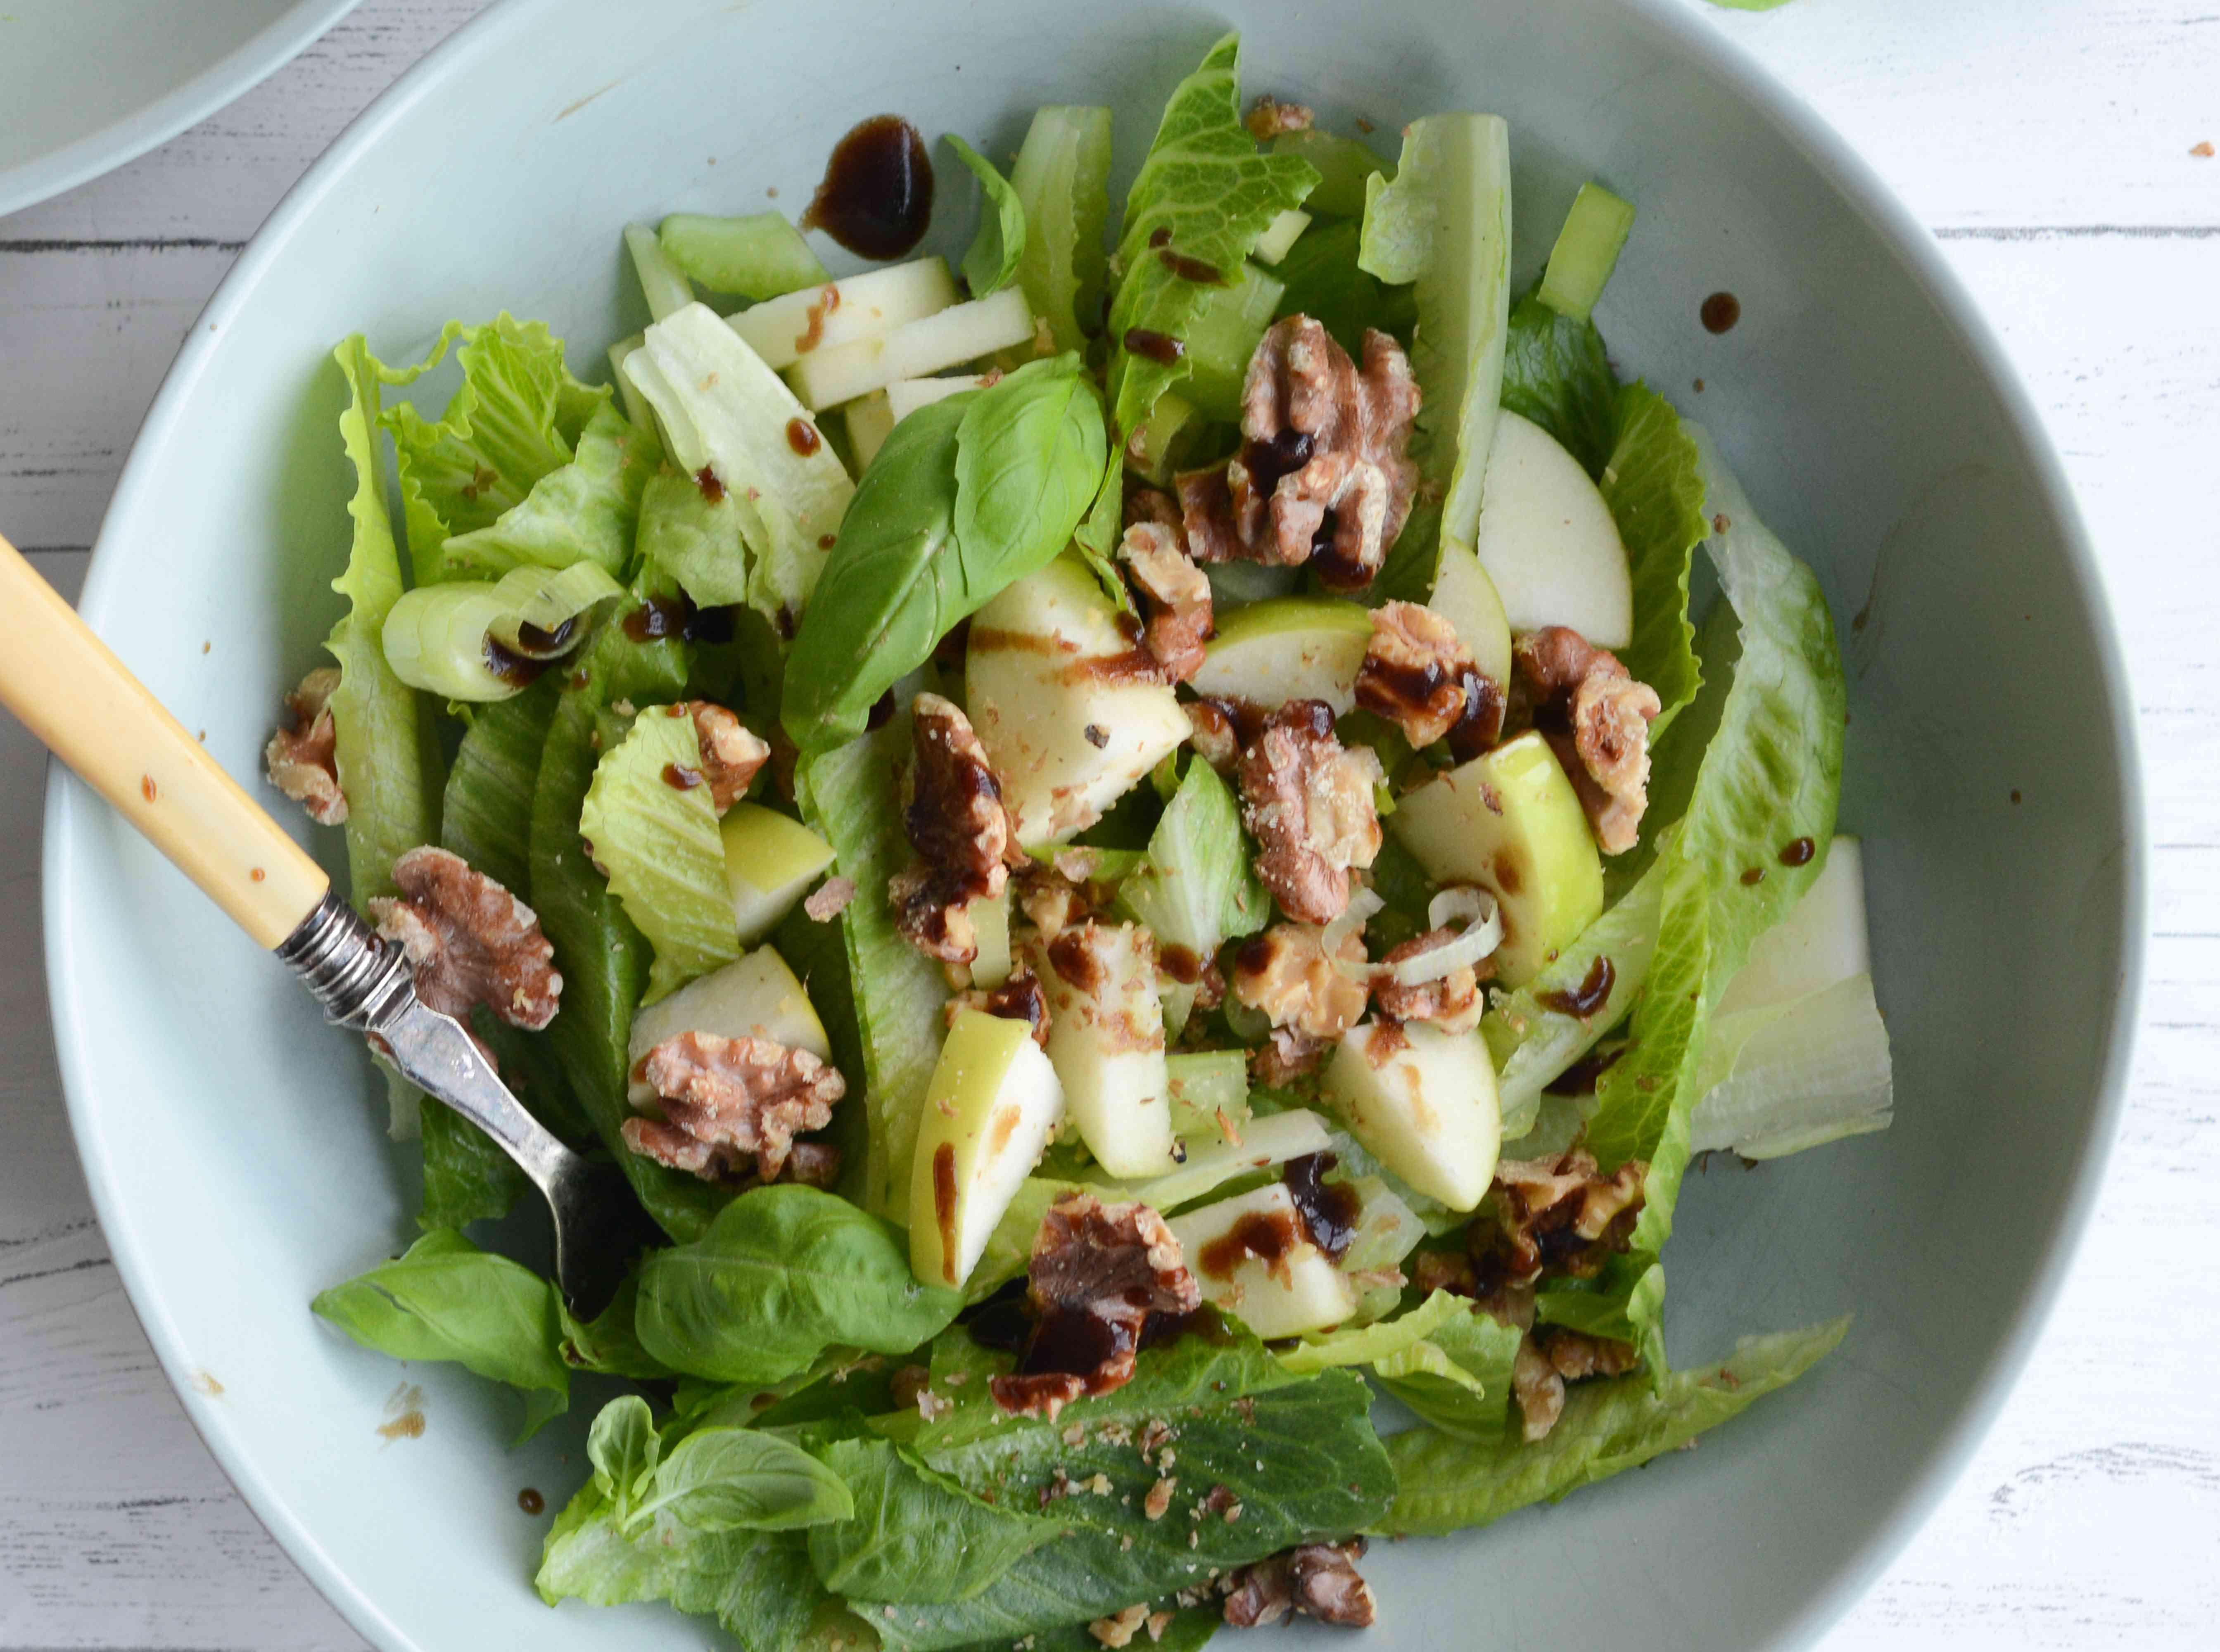 Serve the apple and walnut salad